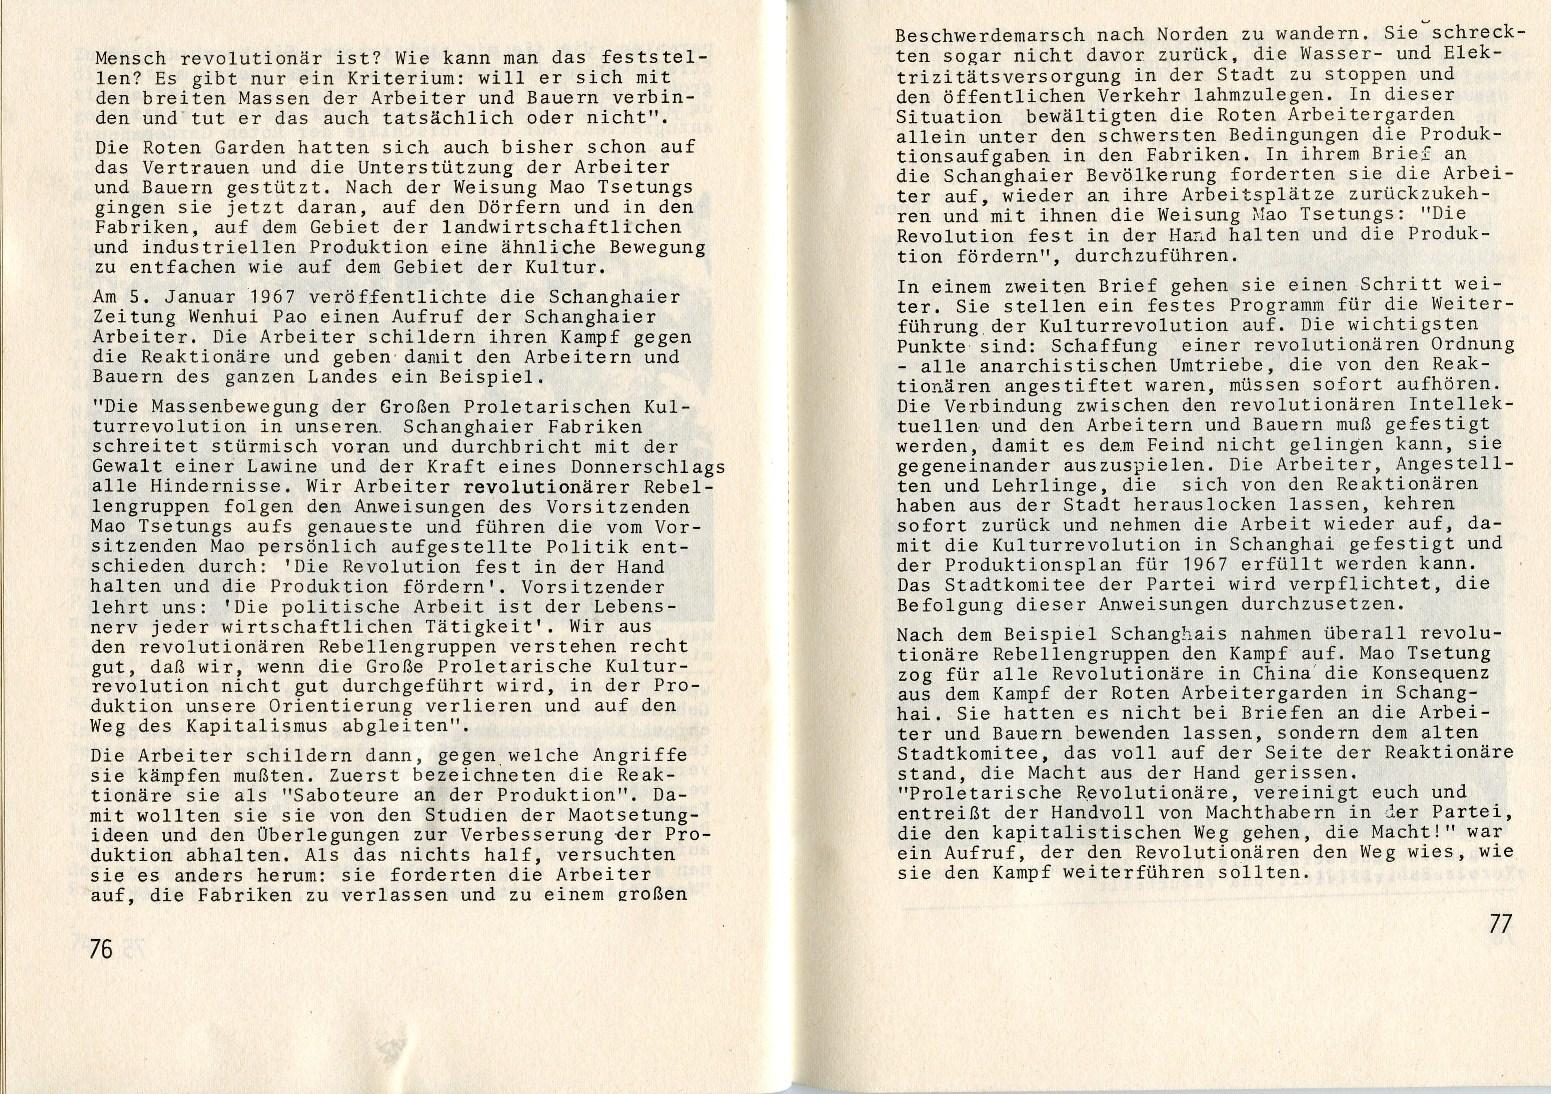 ZB_KPChinas_1971_40